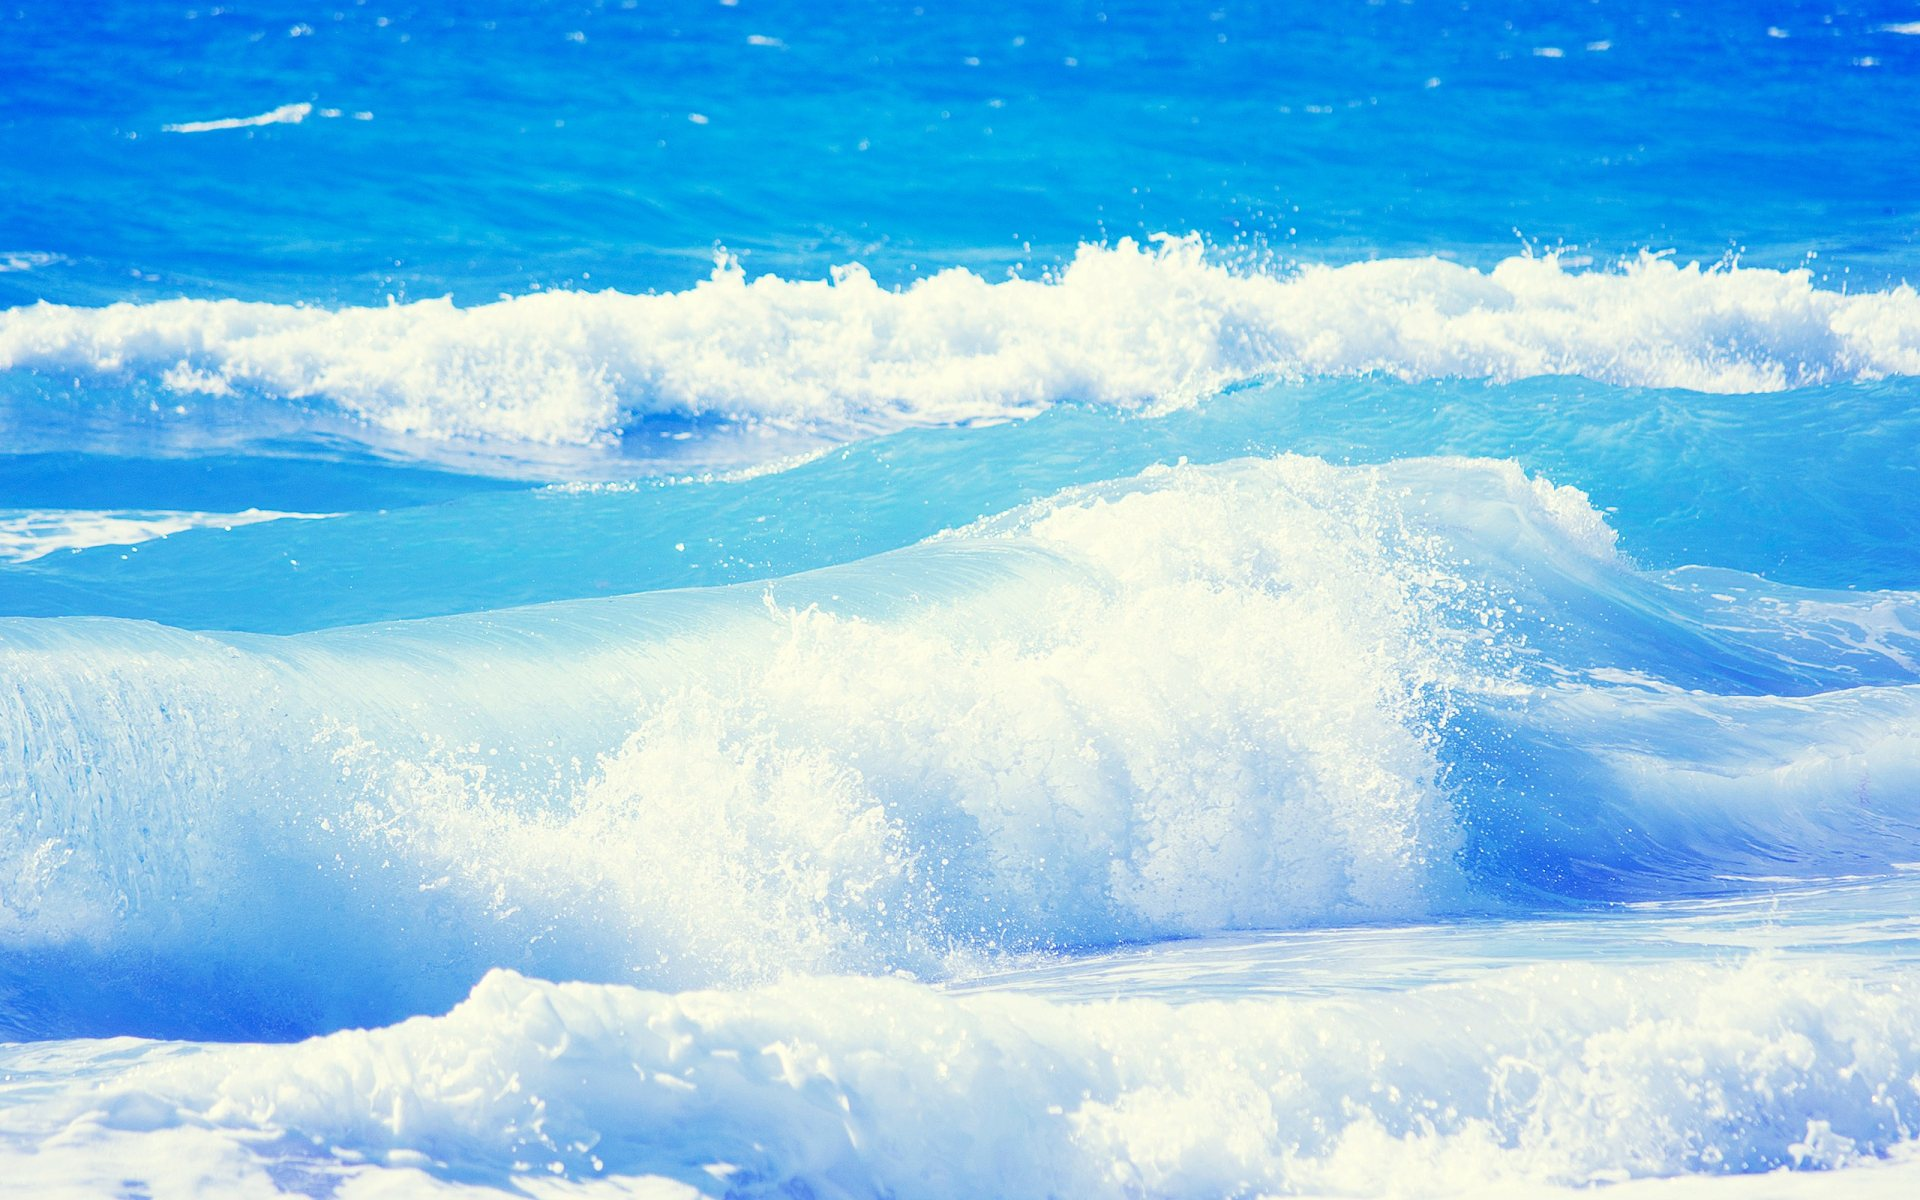 ocean desktop wallpaper free